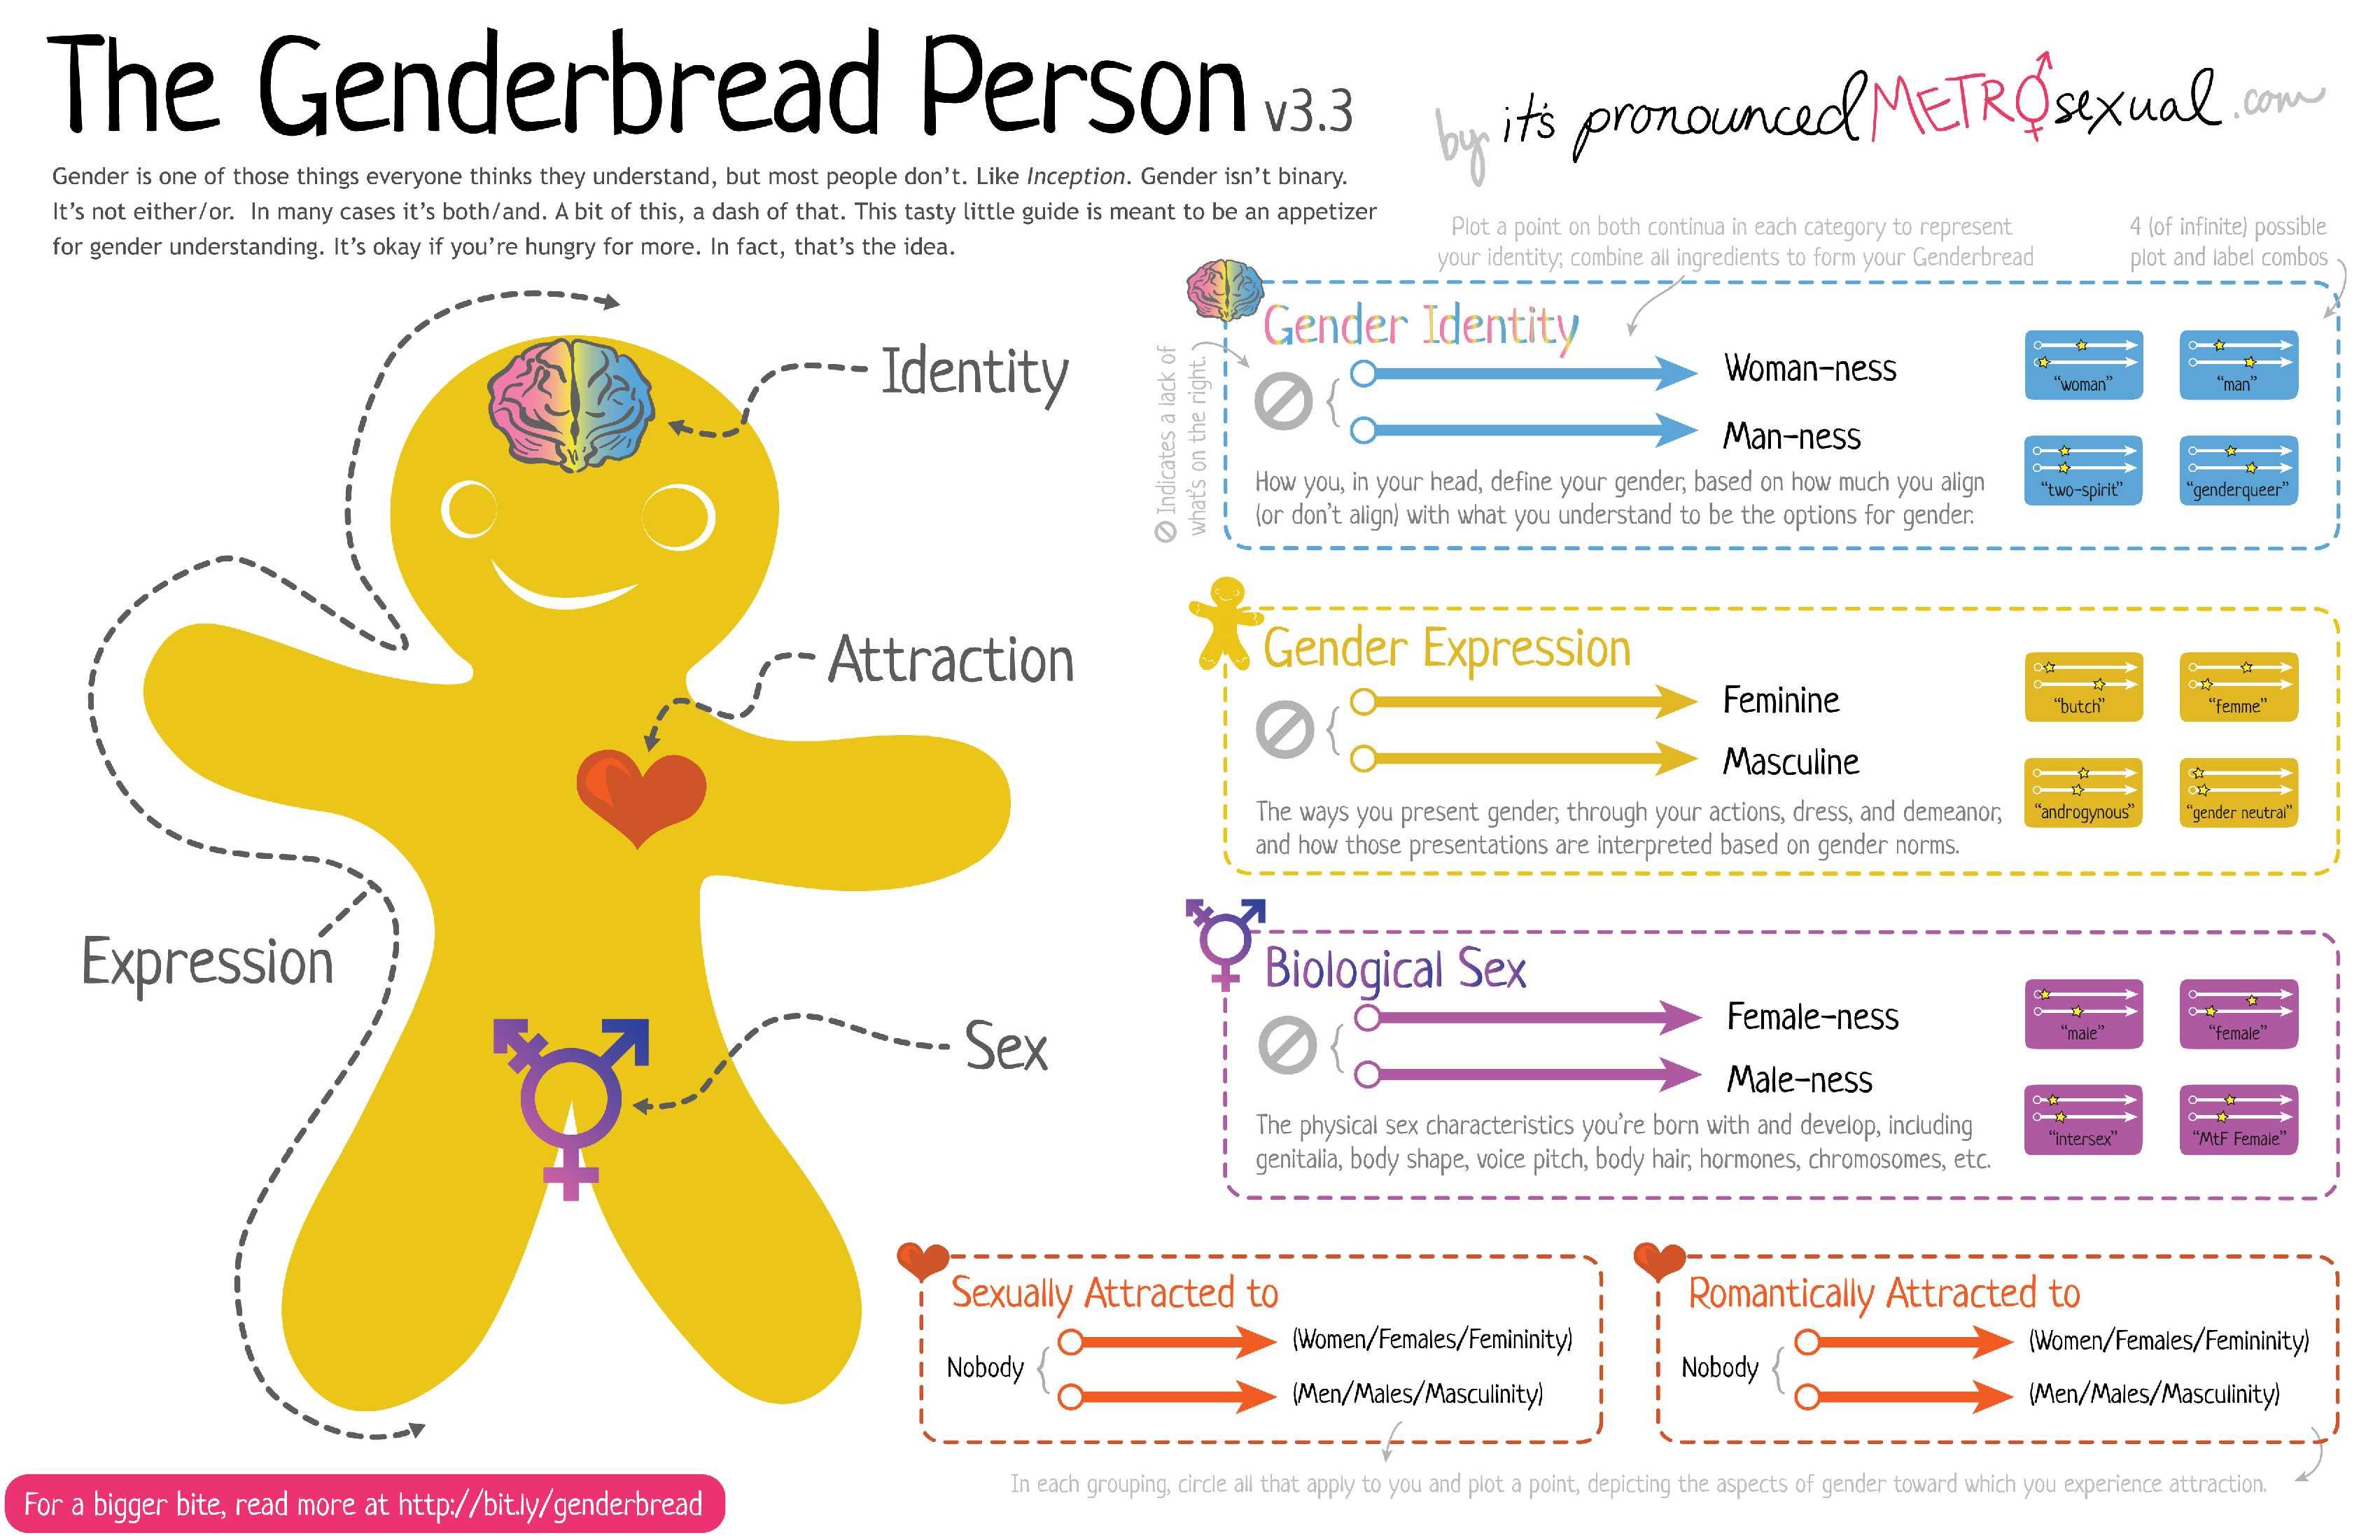 genderbread-person-3-3-hi-res